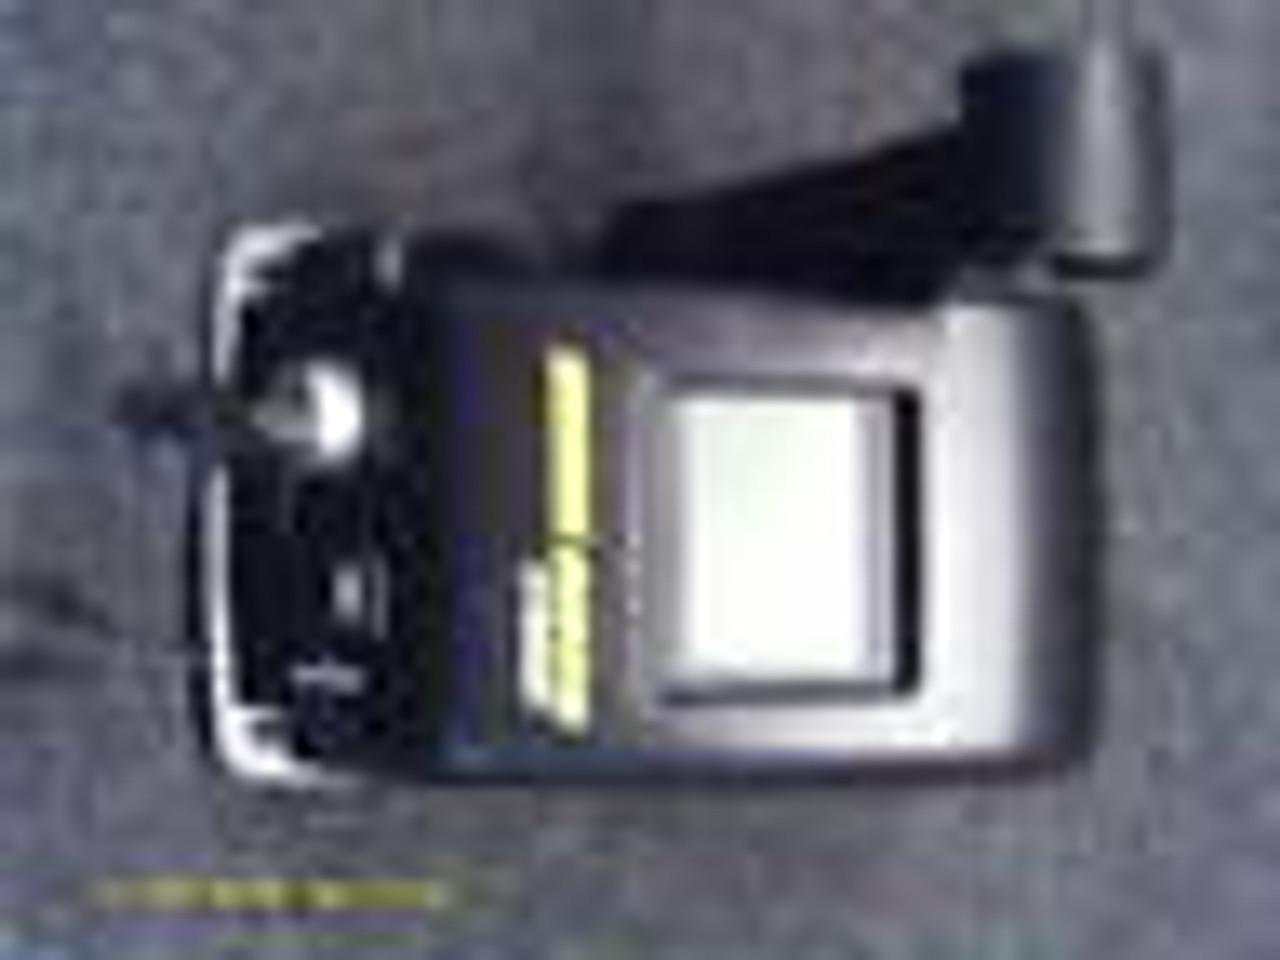 2009 TO PRESENT MINN KOTA E-DRIVE MAIN CONTROL BOARD PN# 2884017